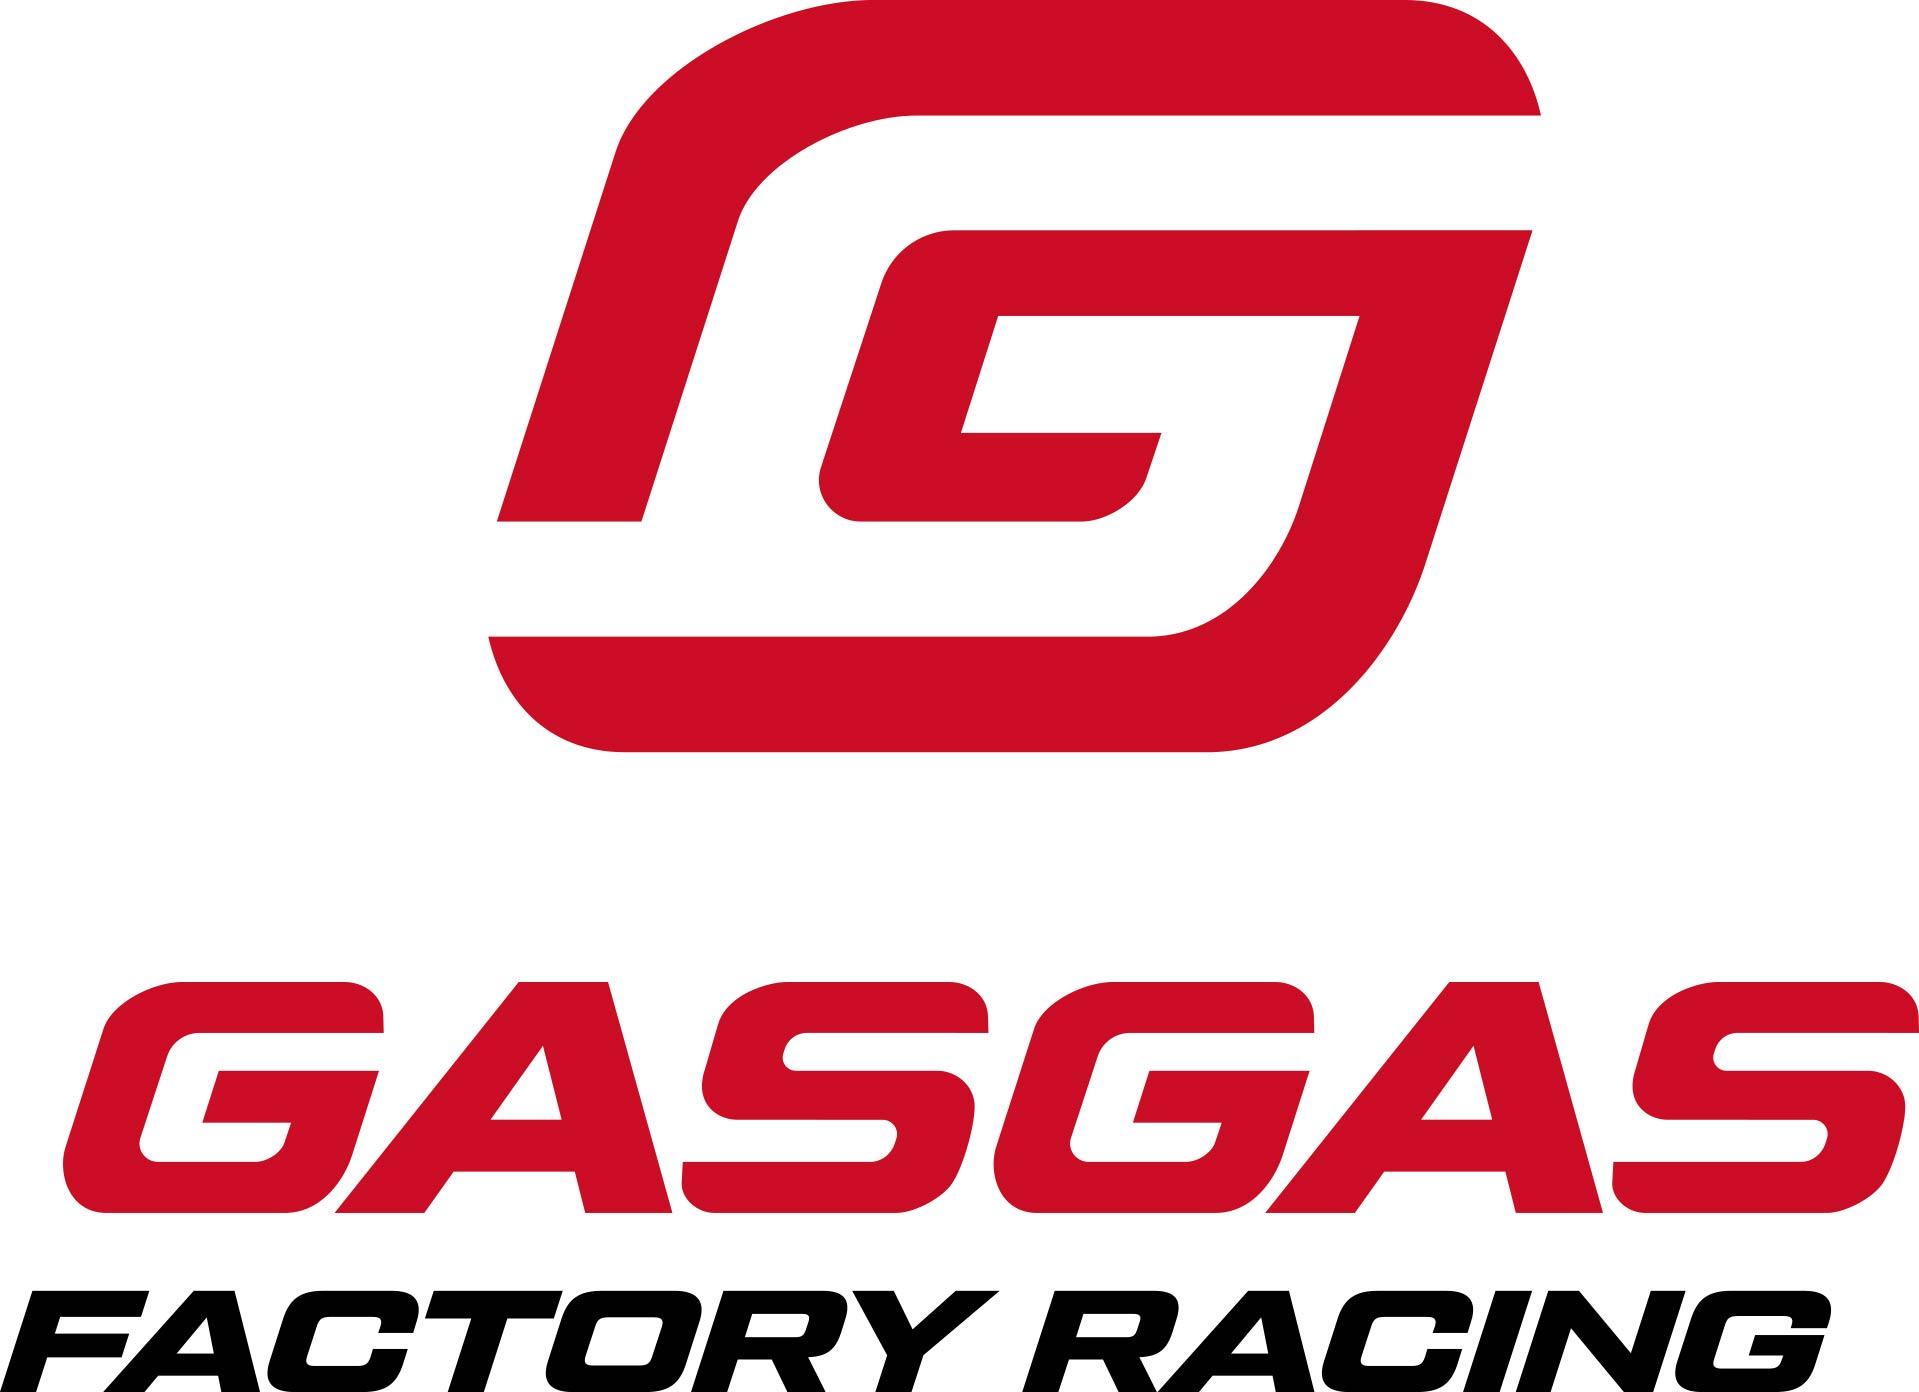 GasGas Logo Factory Racing